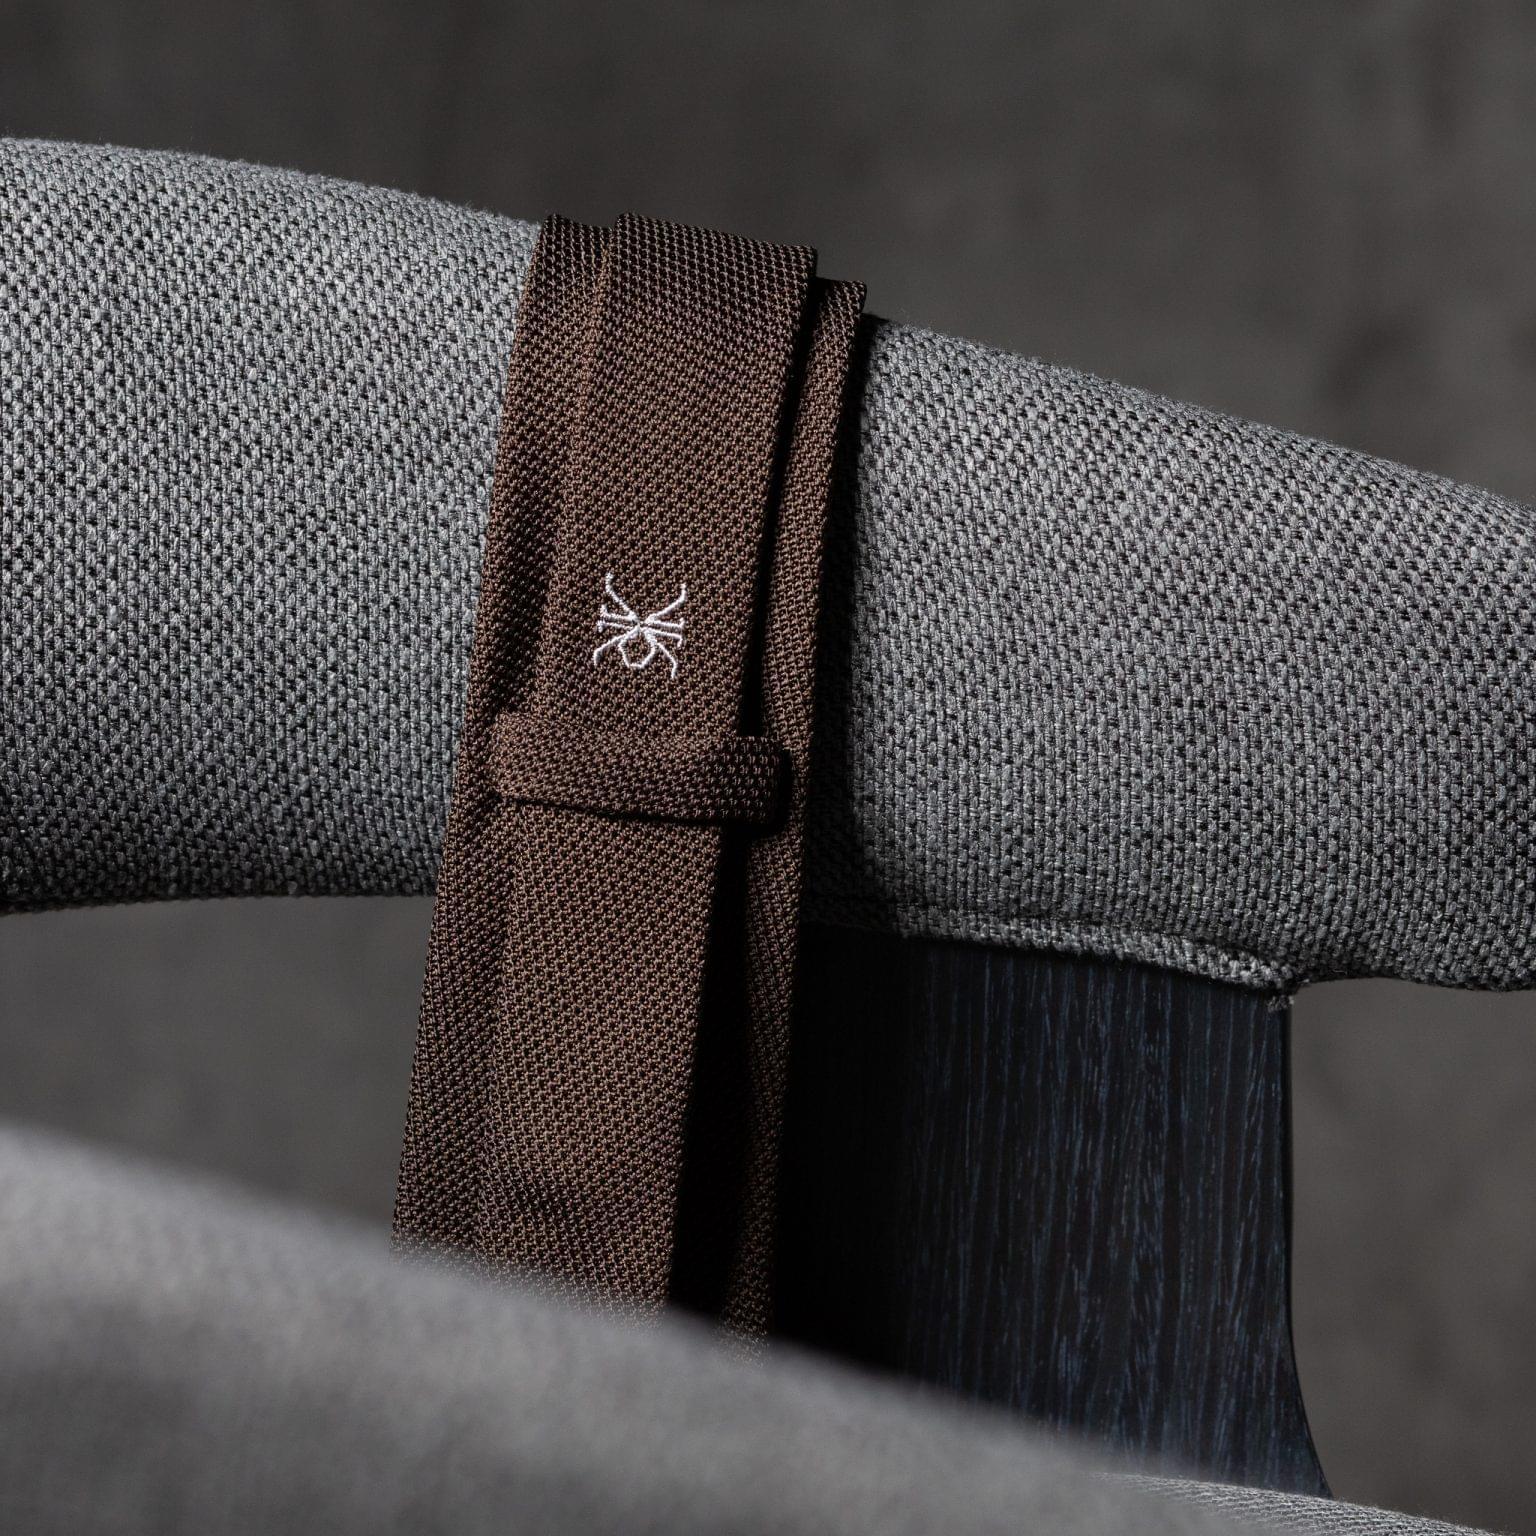 GRENADINE-0279-Tie-Initials-Corbata-Iniciales-The-Seelk-4